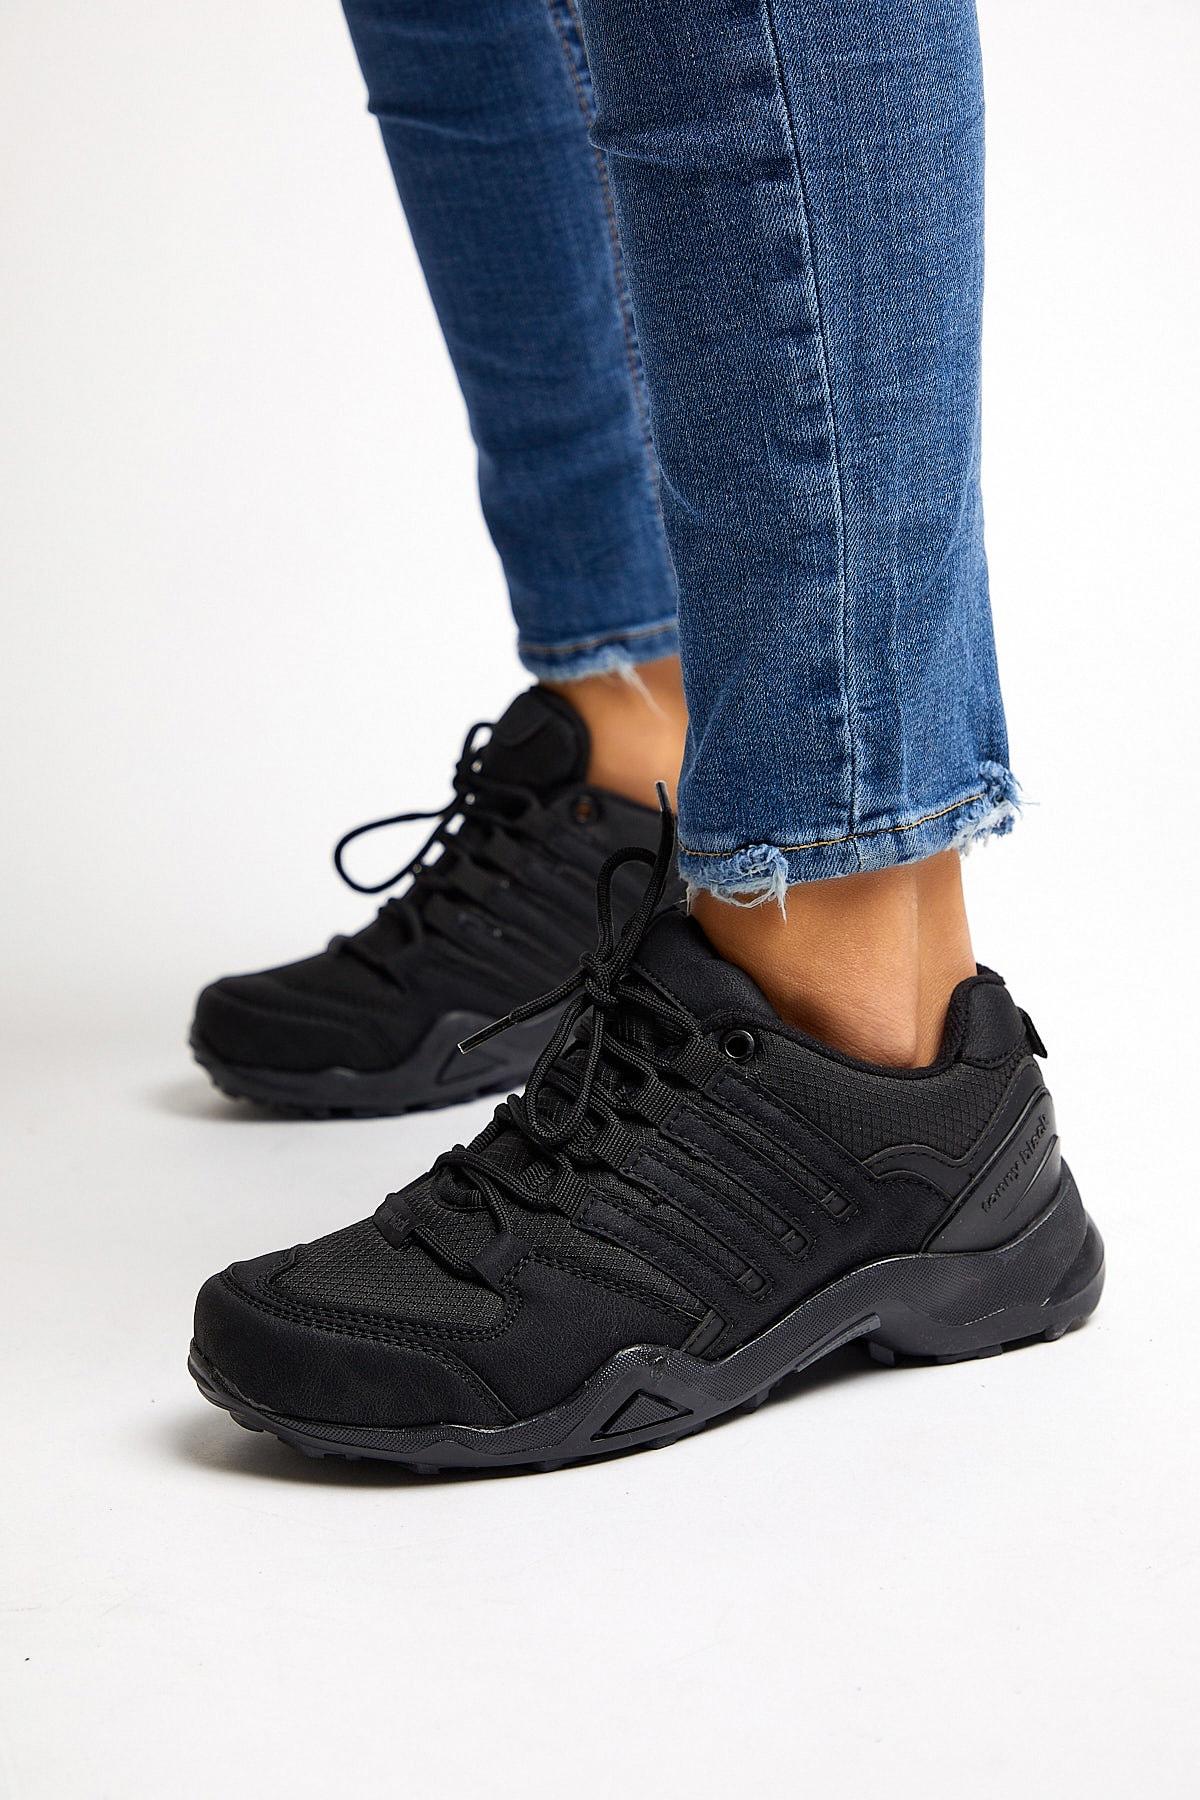 Tonny Black Unısex Trekkıng Ayakkabı Siyah Tb241 2